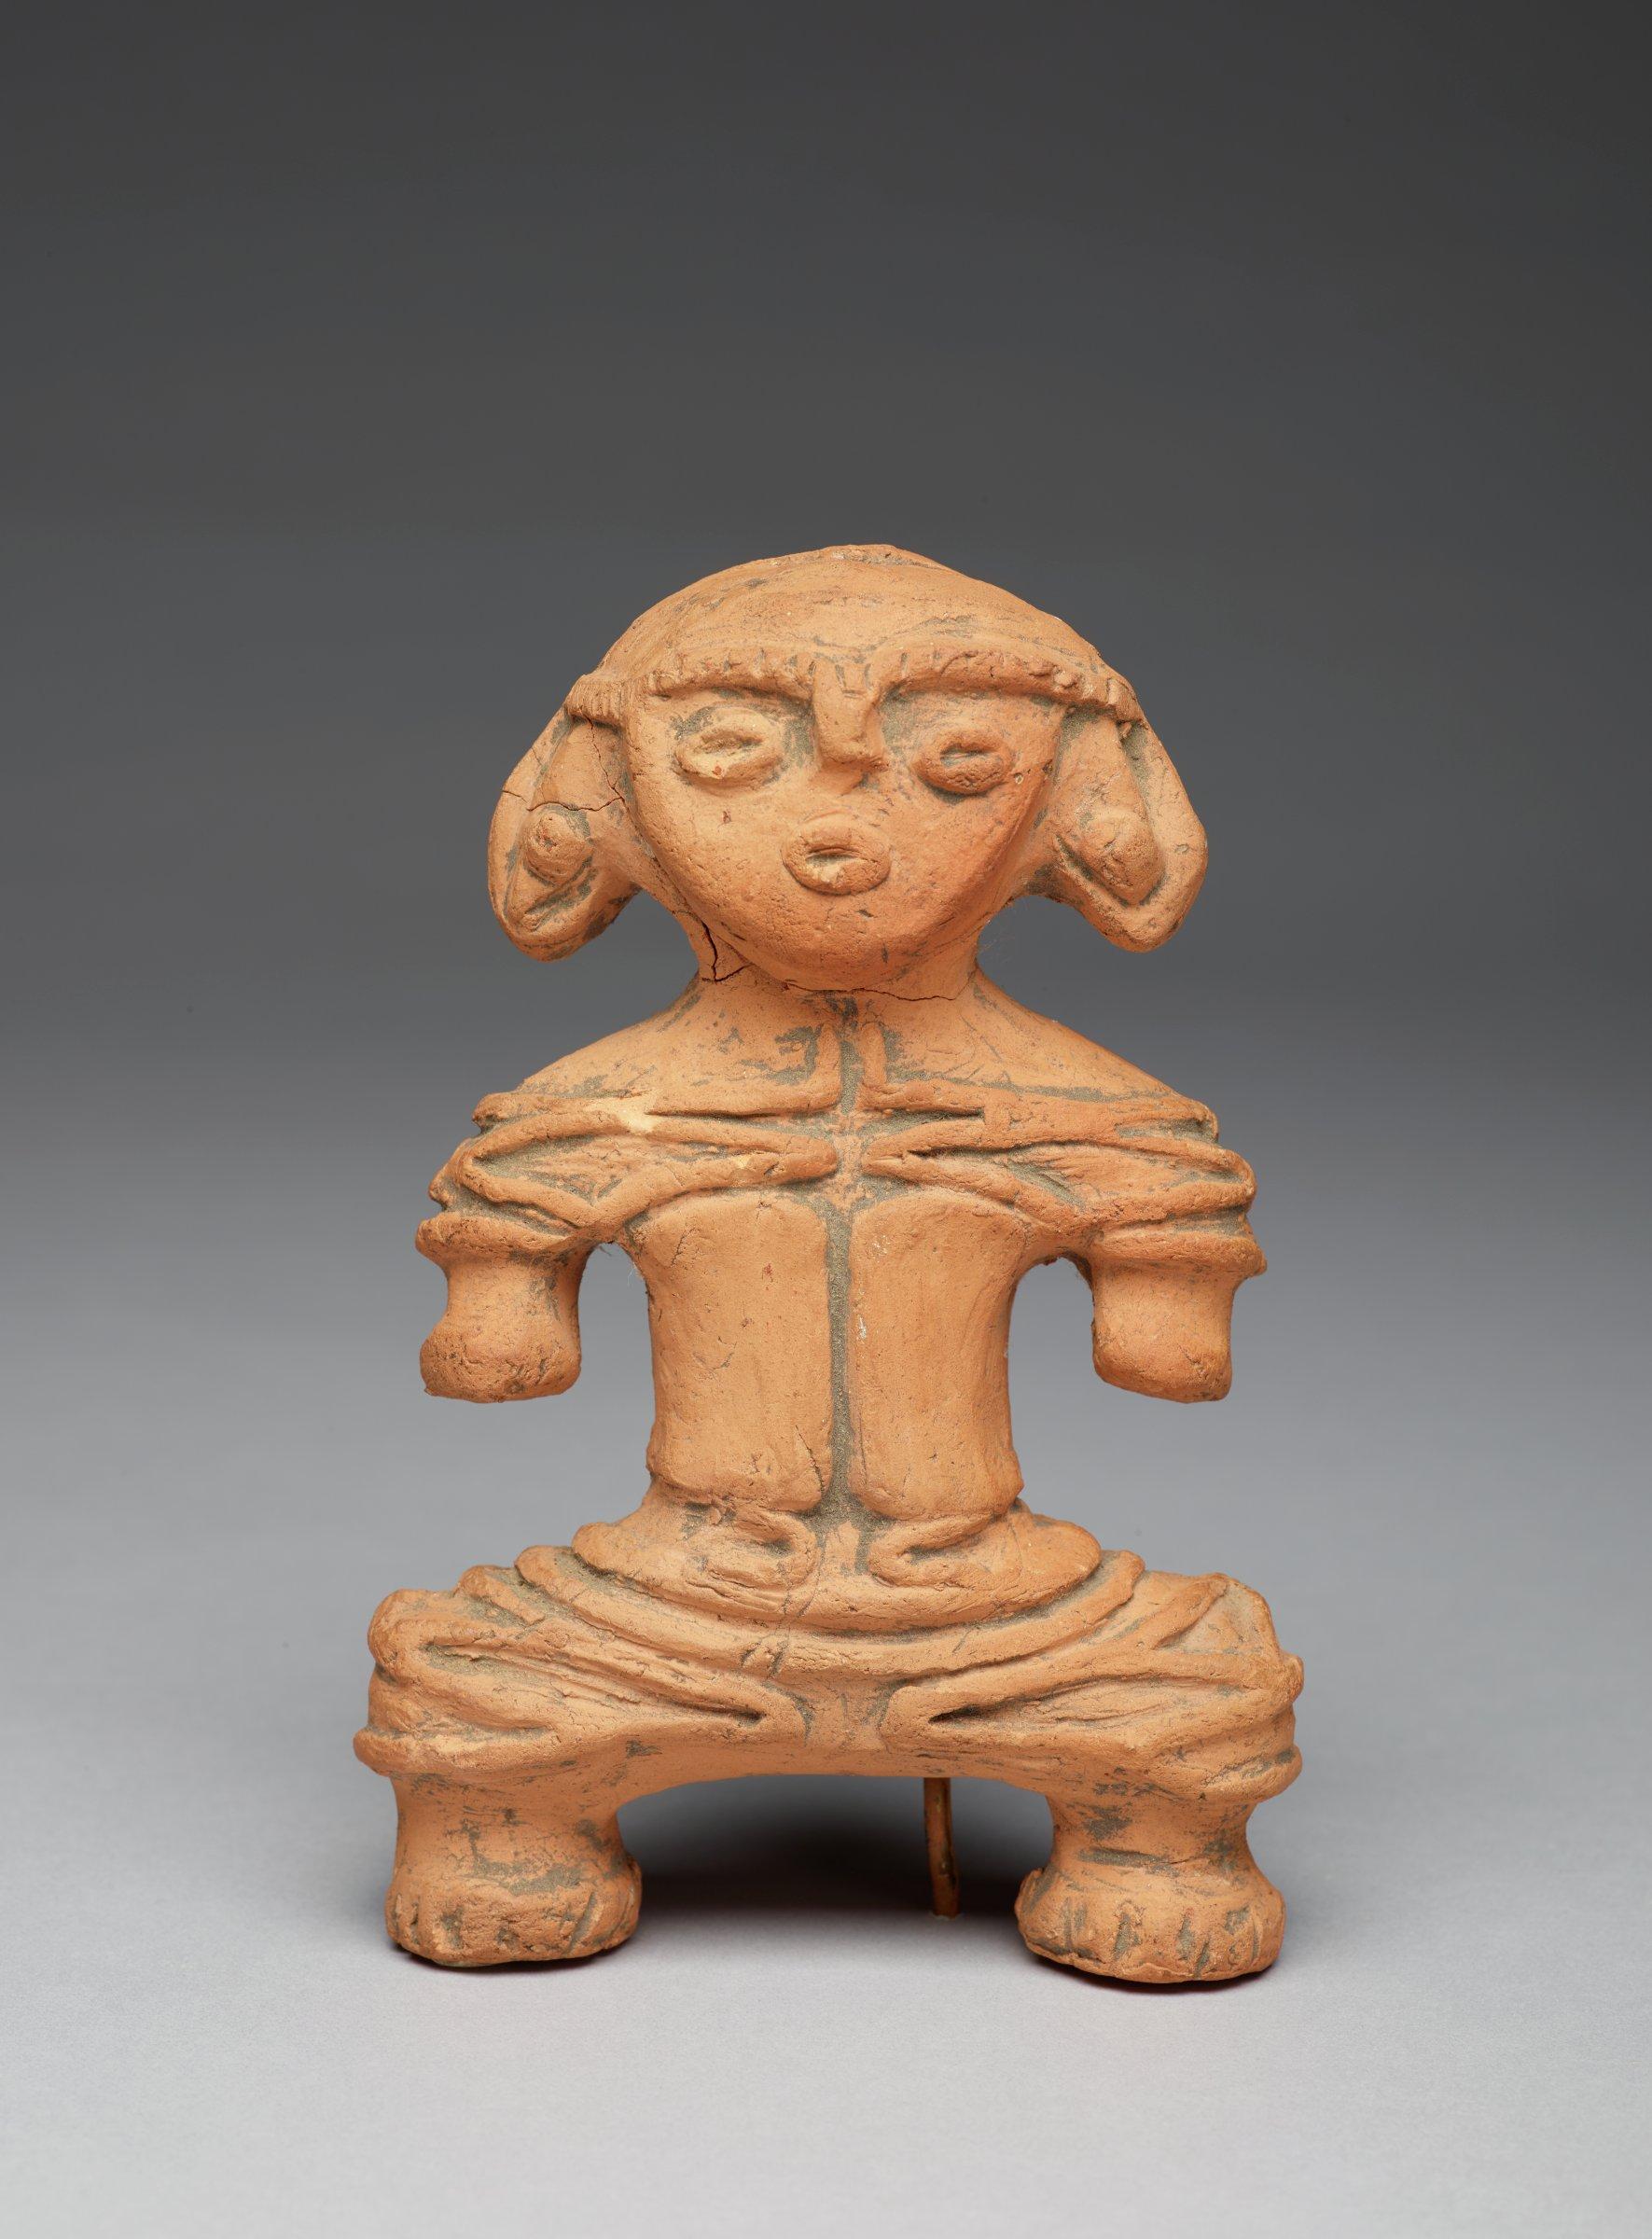 Votive Figure (Dogu), Japan, clay